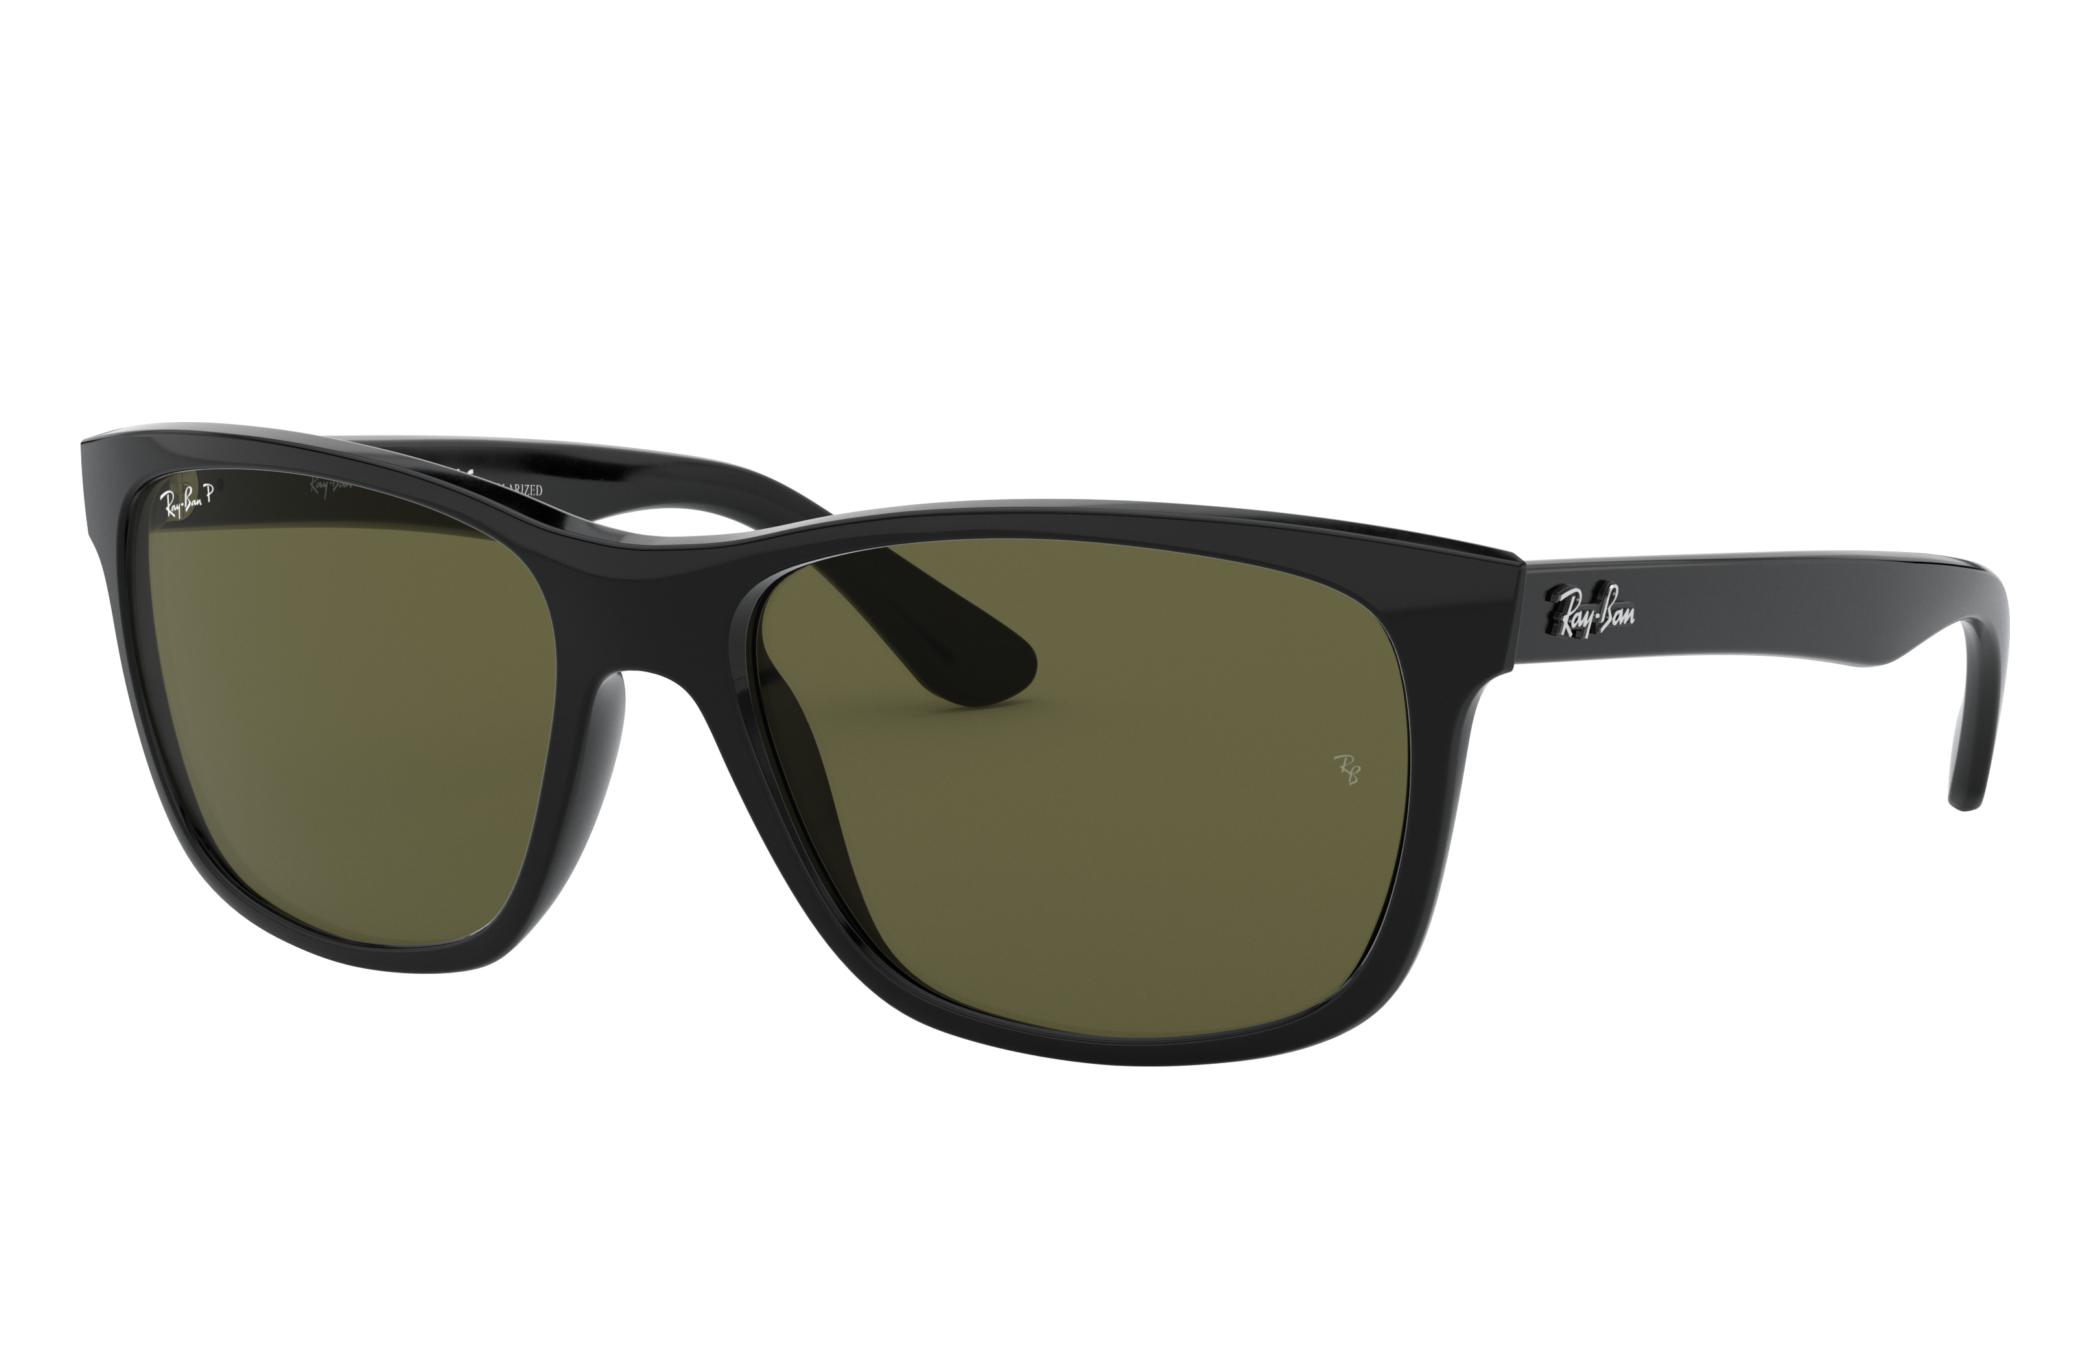 Ray-Ban Rb4181 Black, Polarized Green Lenses - RB4181